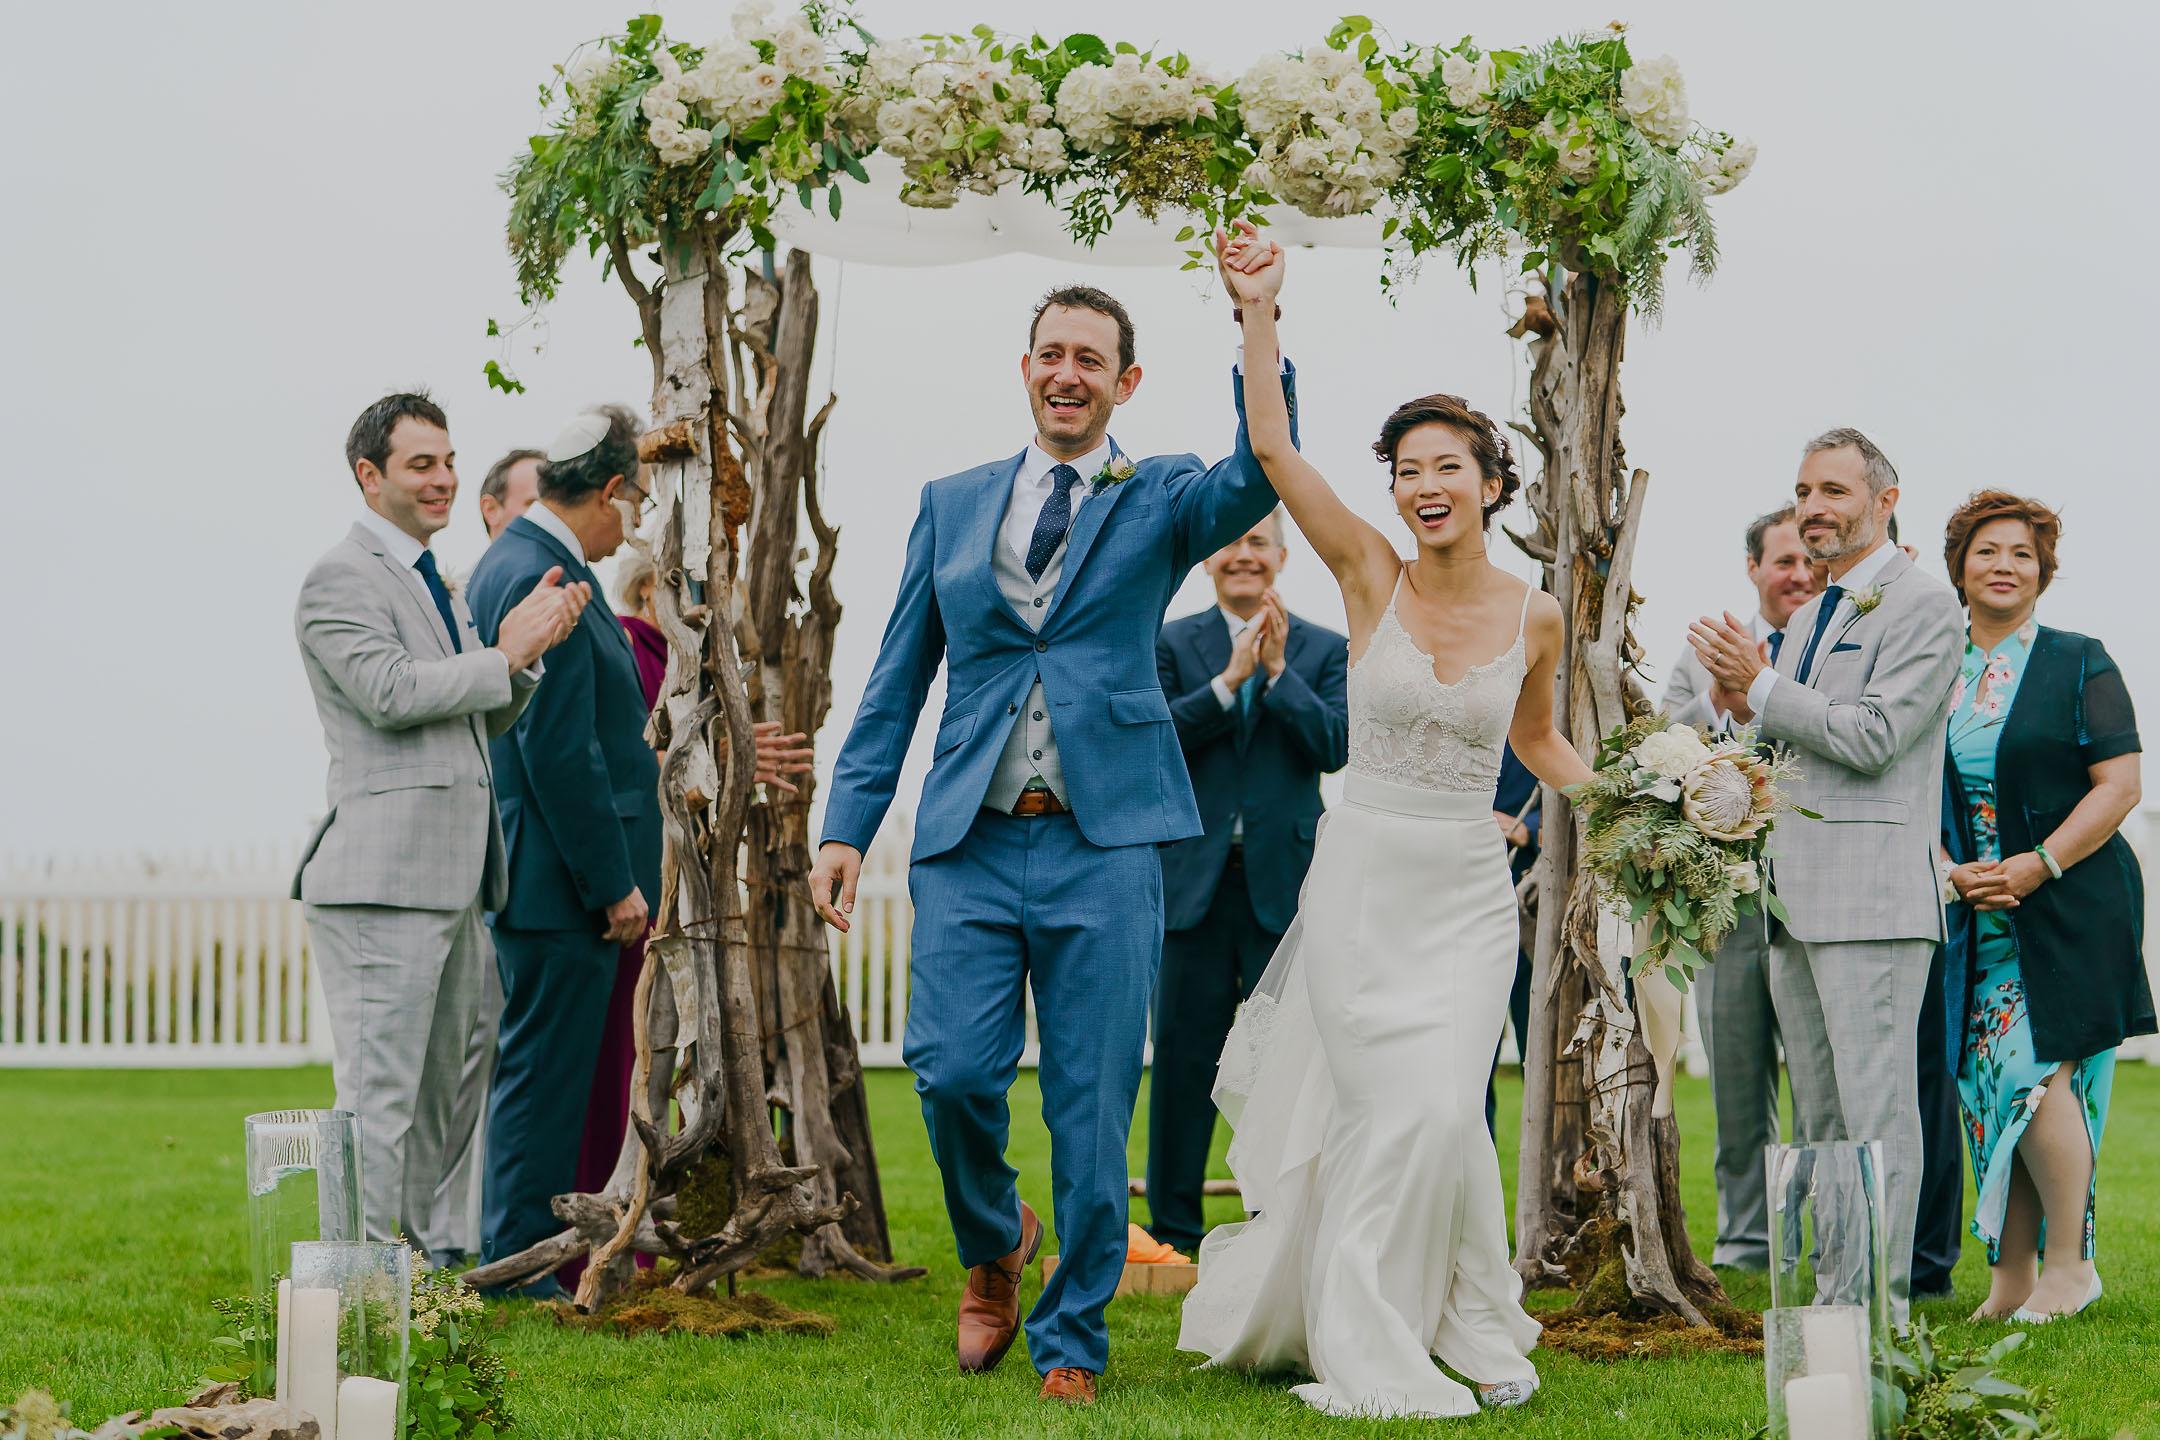 Chatham_Bars_Inn_wedding_32.jpg